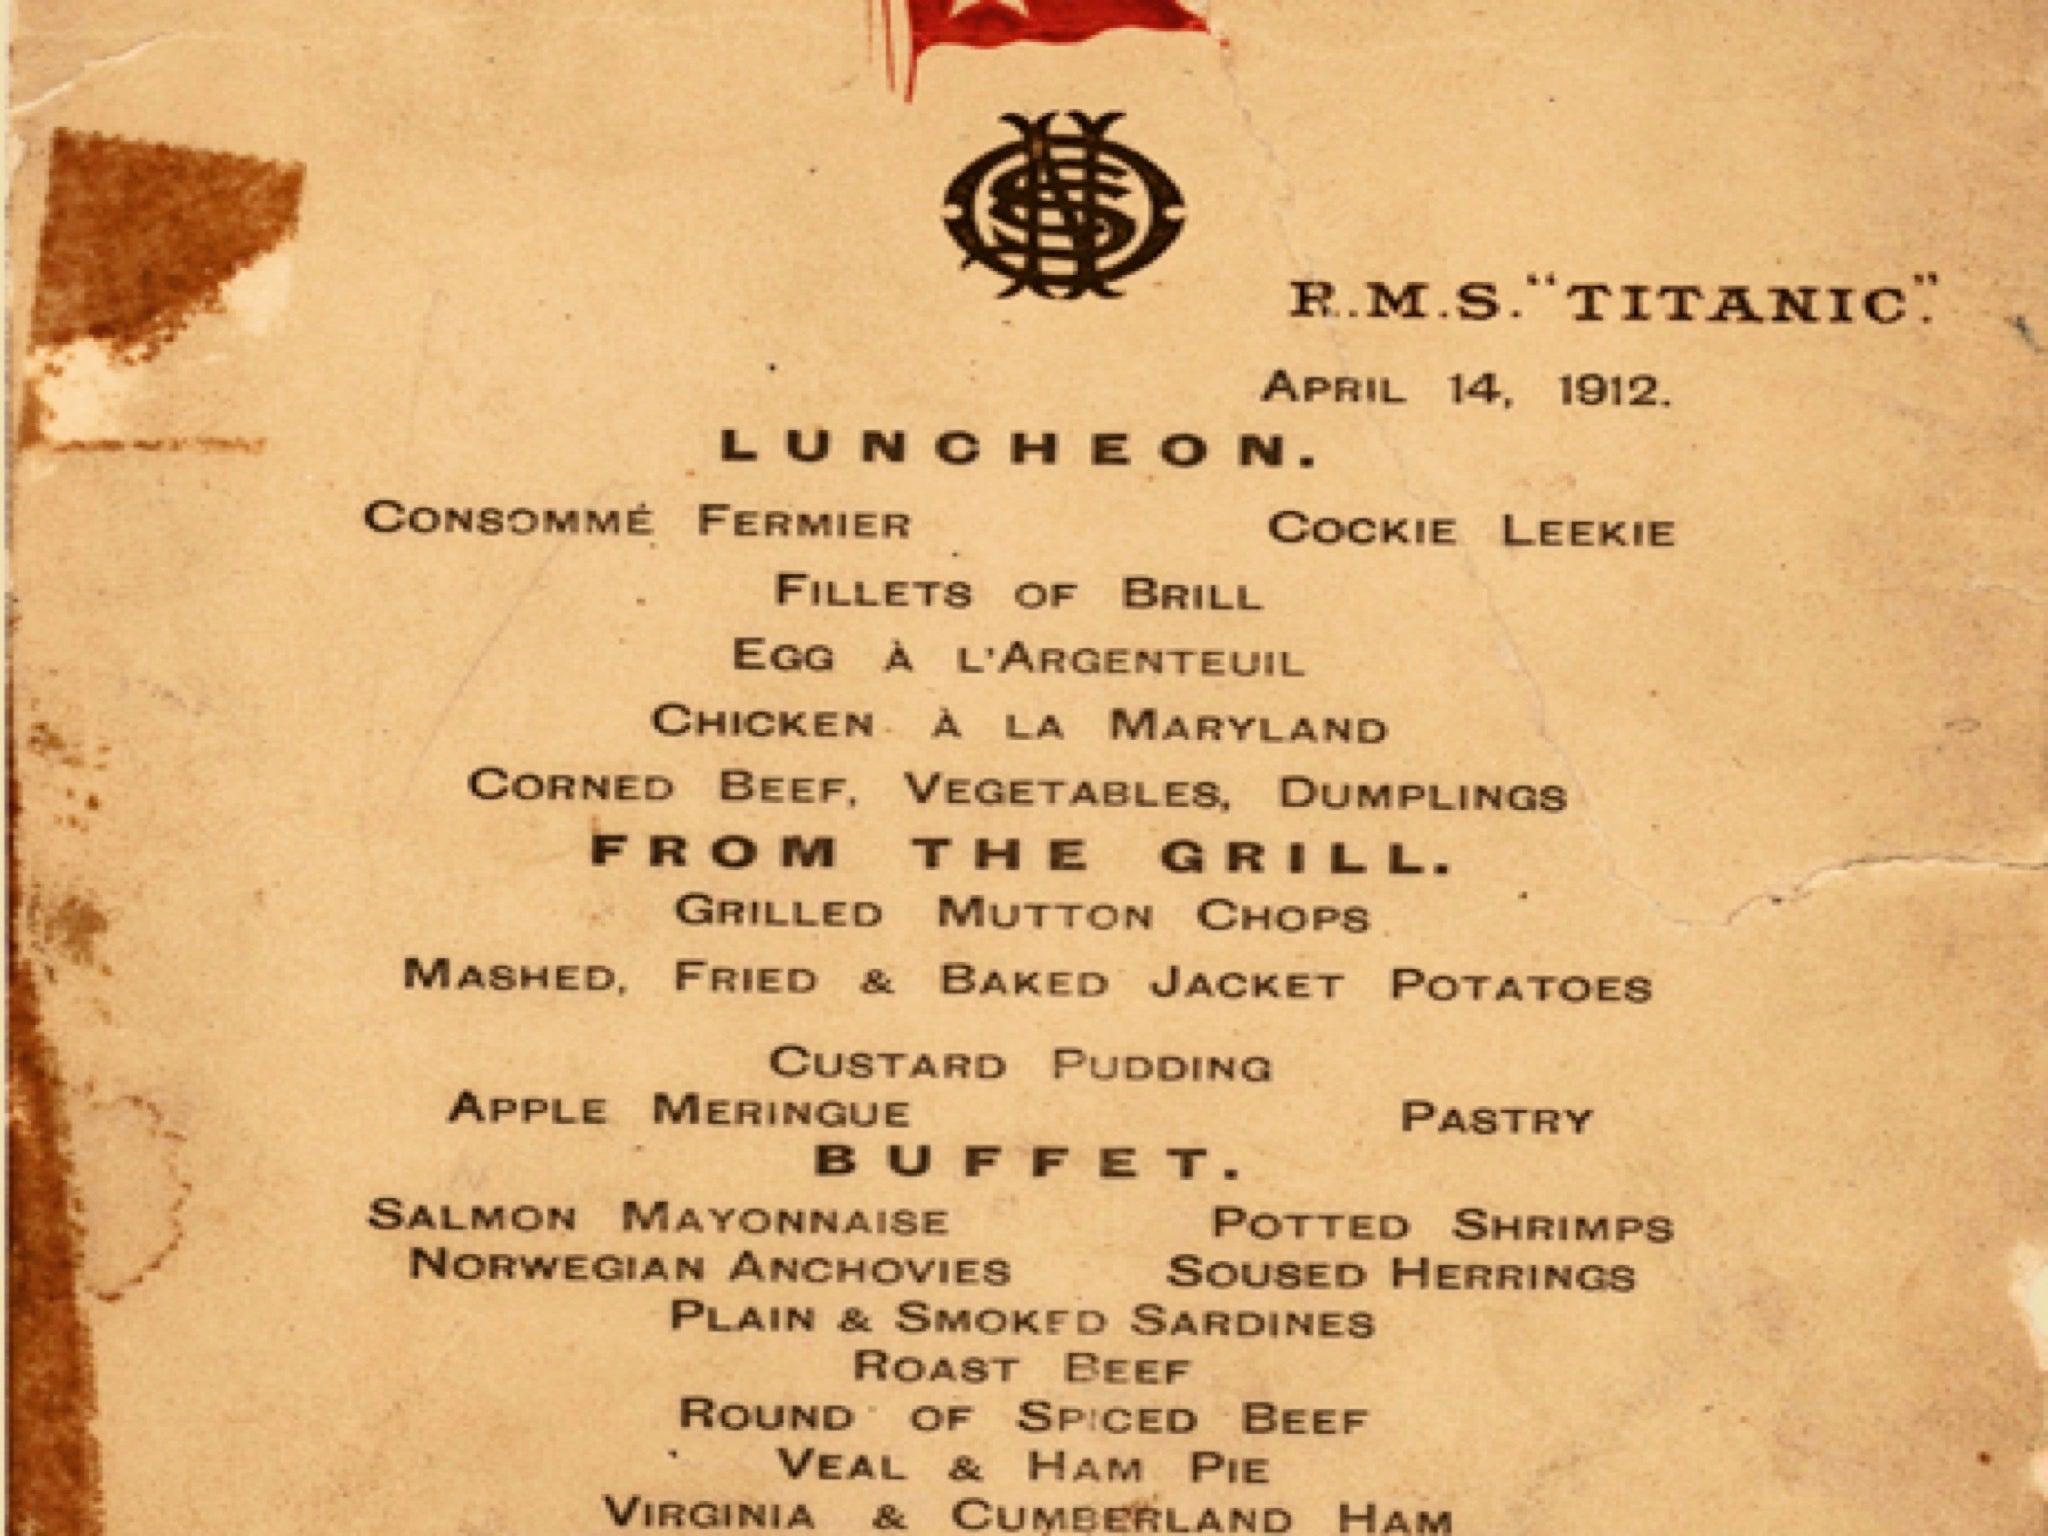 Resultado de imagen para titanic menu